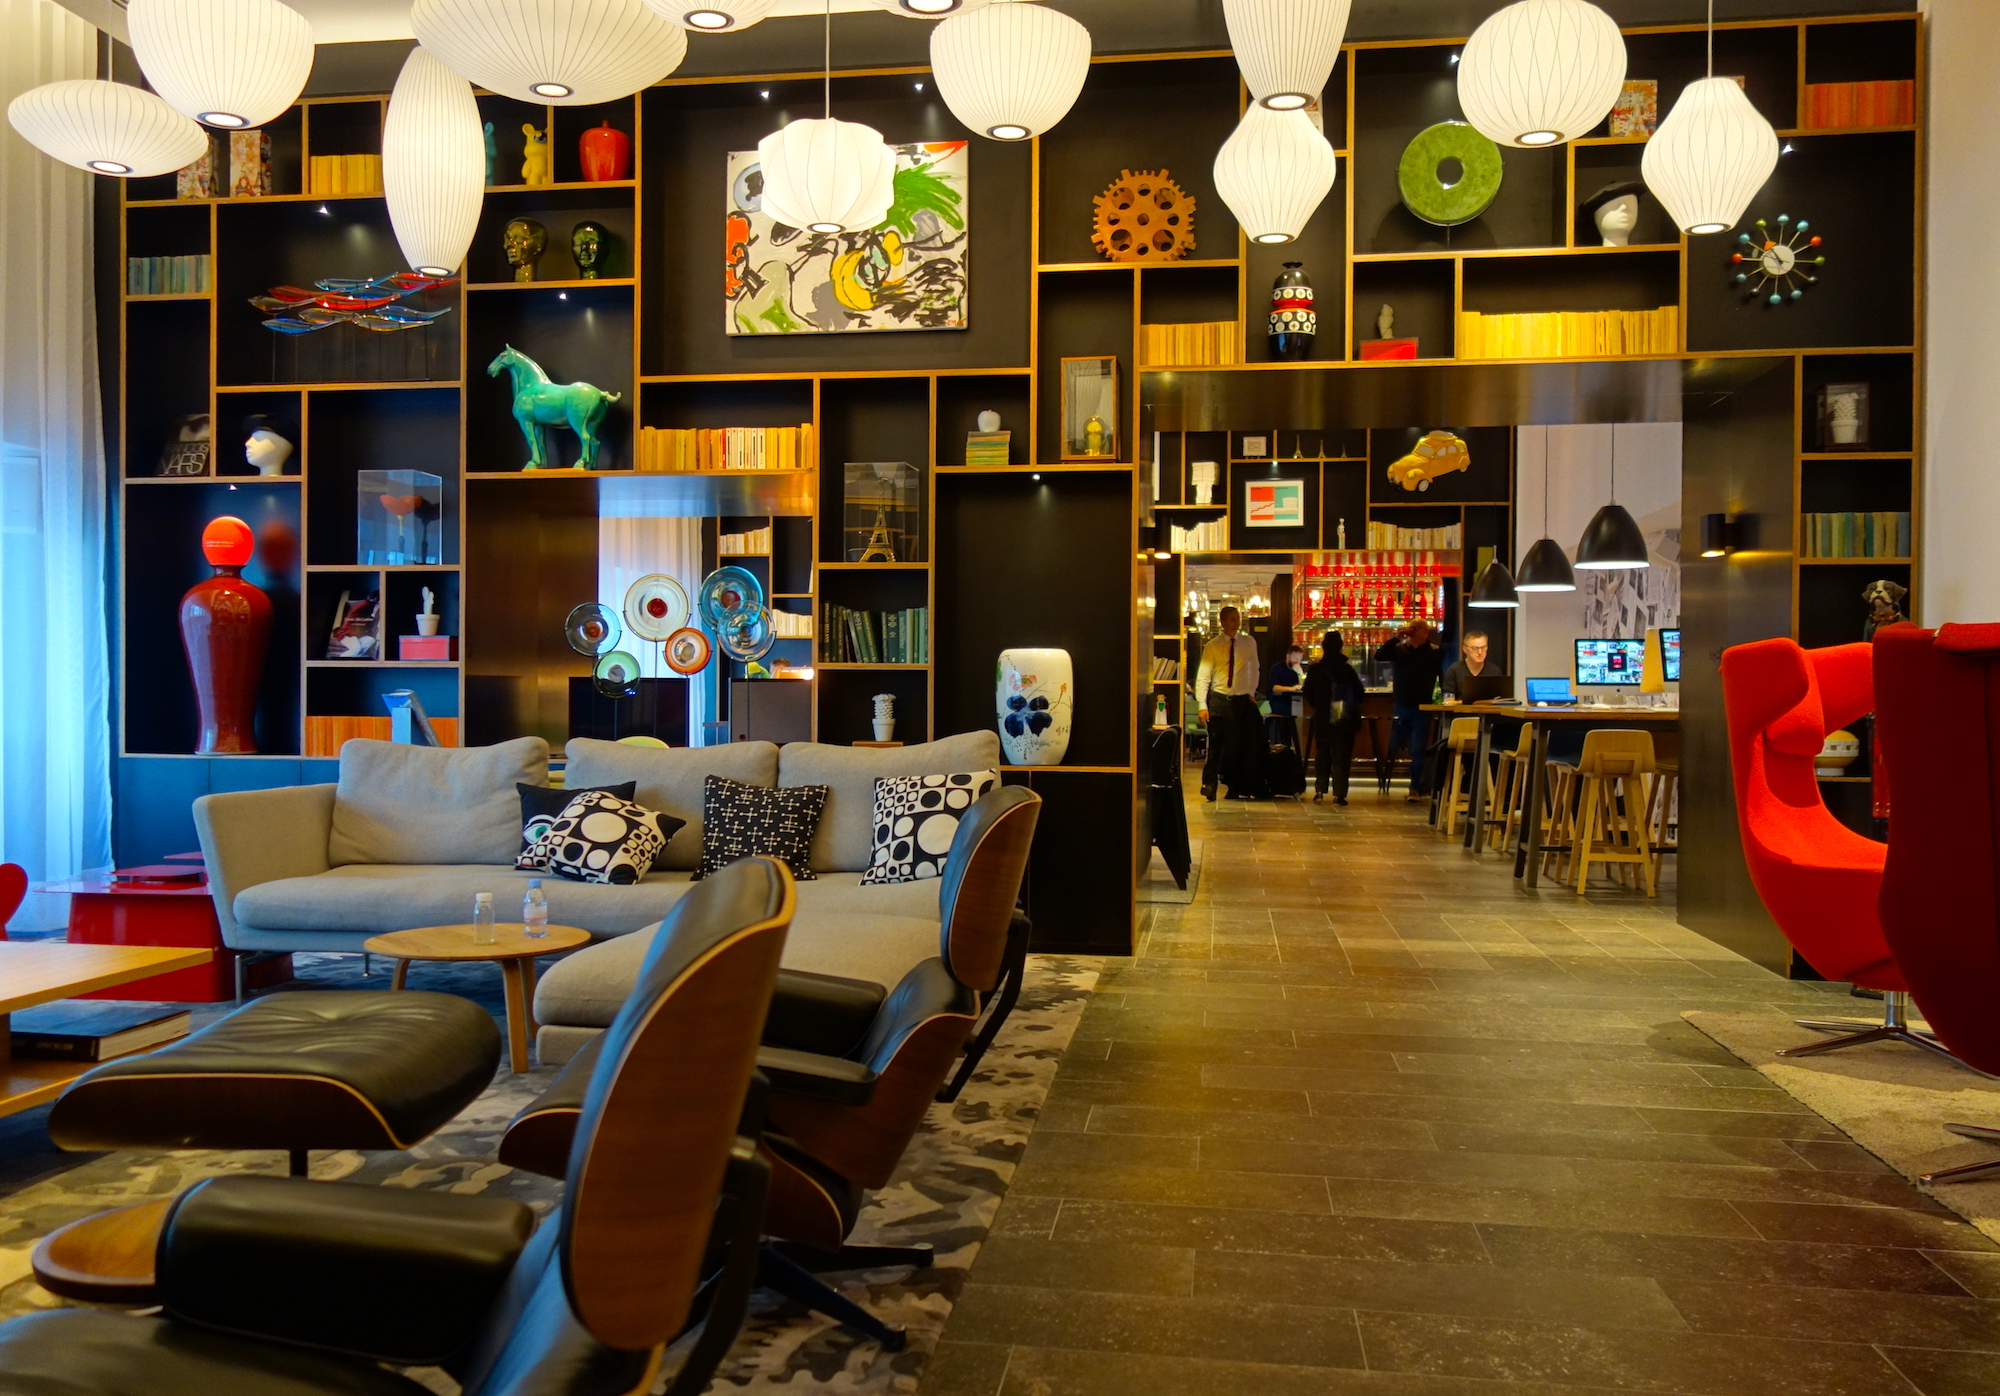 citizenm gare de lyon a casual arty hotel in paris. Black Bedroom Furniture Sets. Home Design Ideas